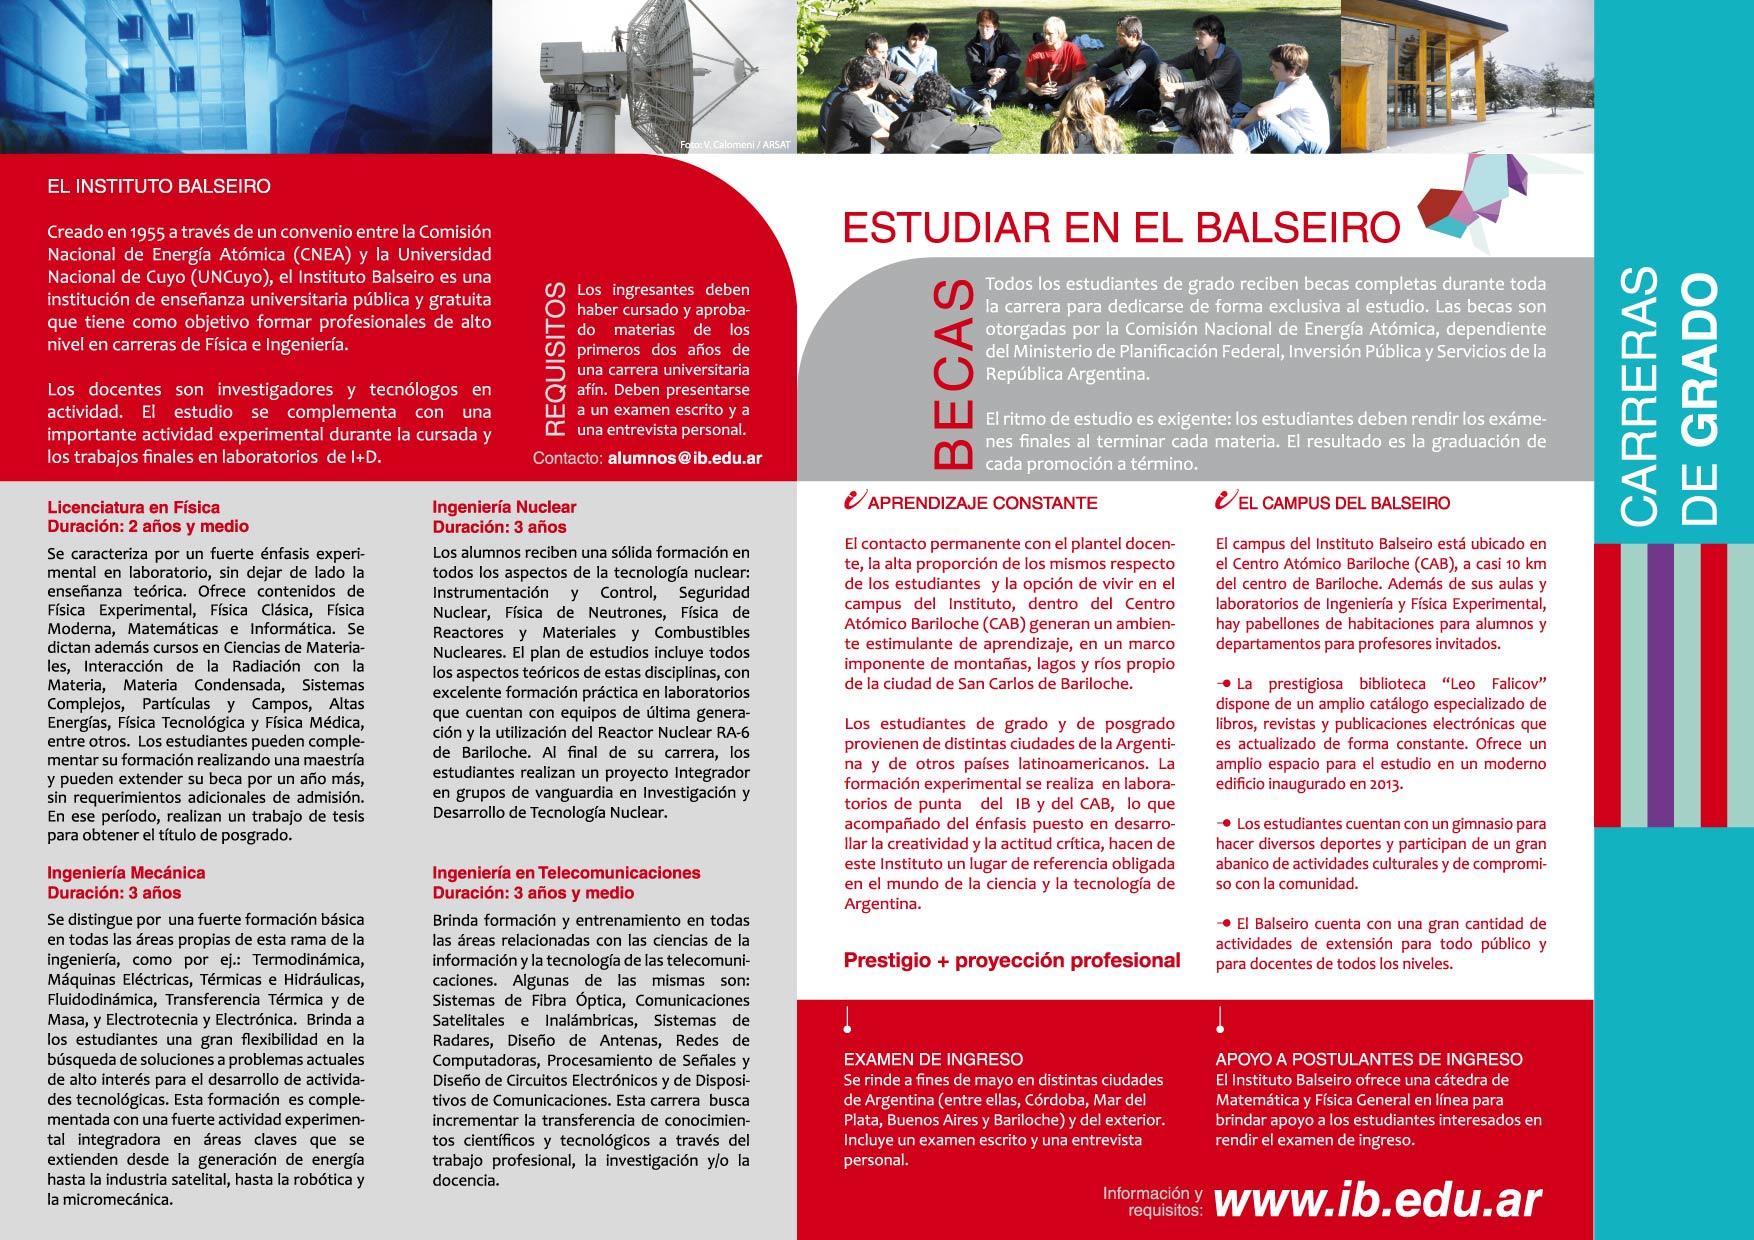 El Instituto Balseiro, presente en dos Expos universitarias